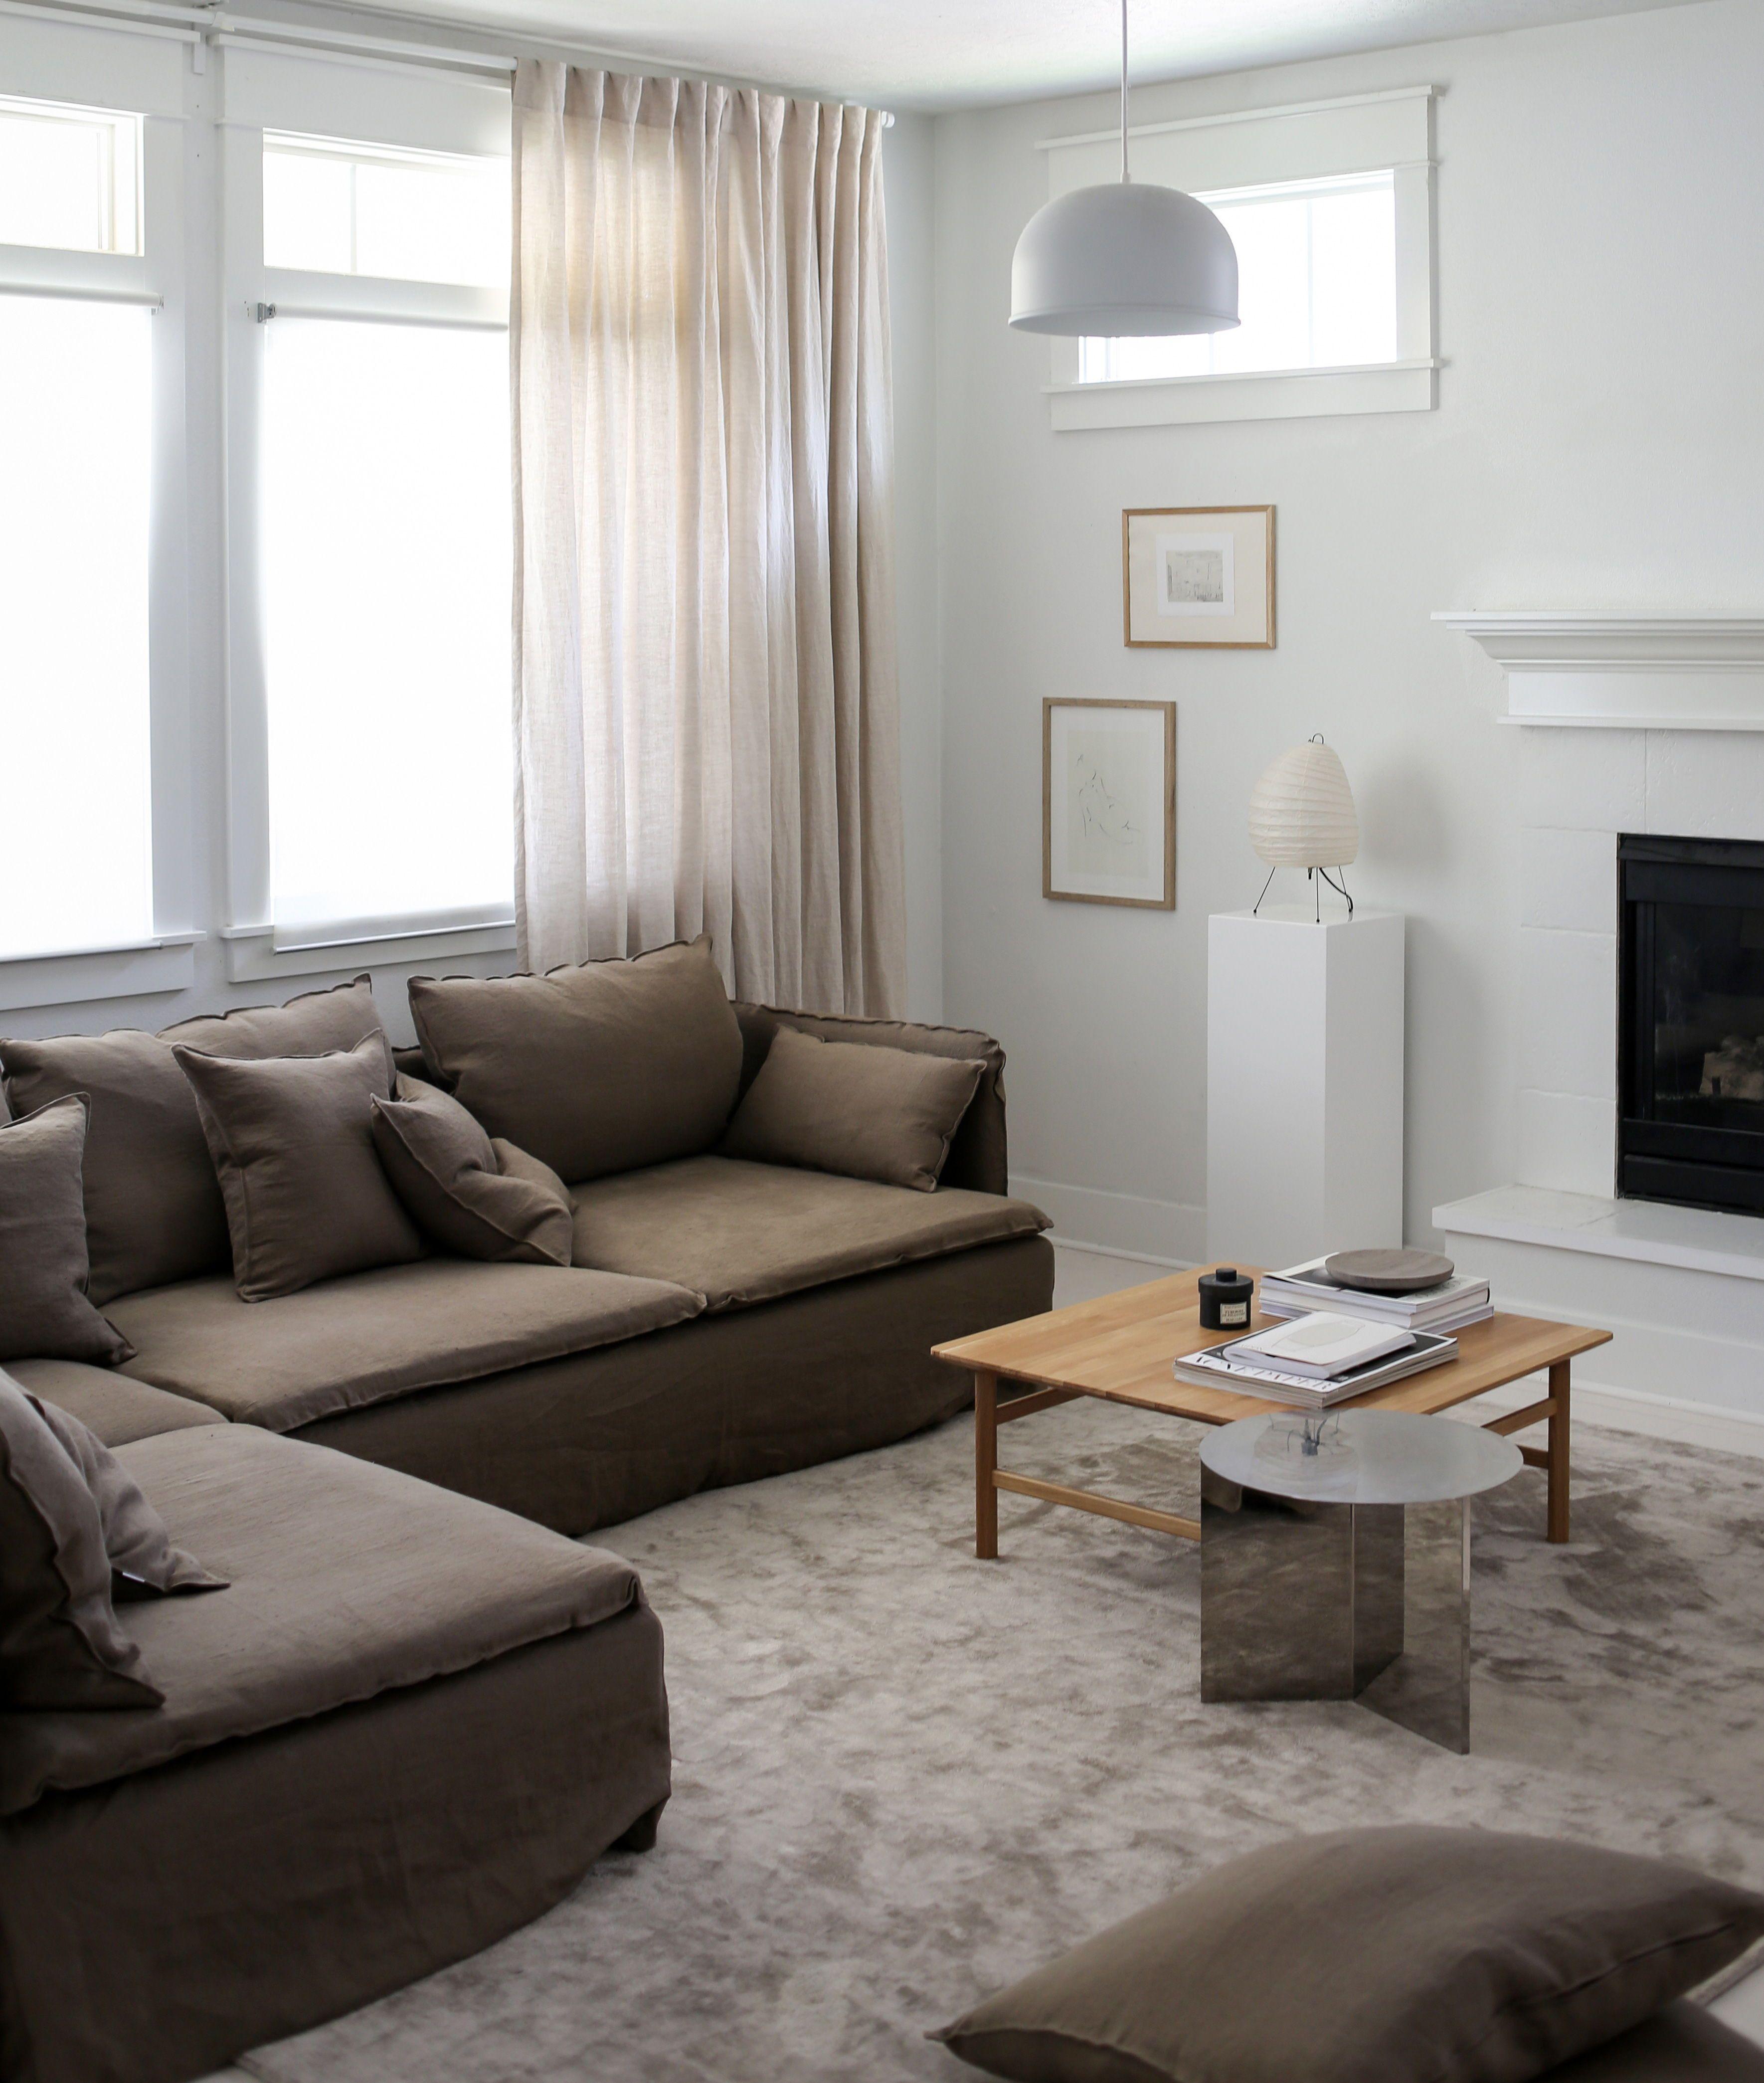 10 Stunning Scandinavian Inspired Living Room